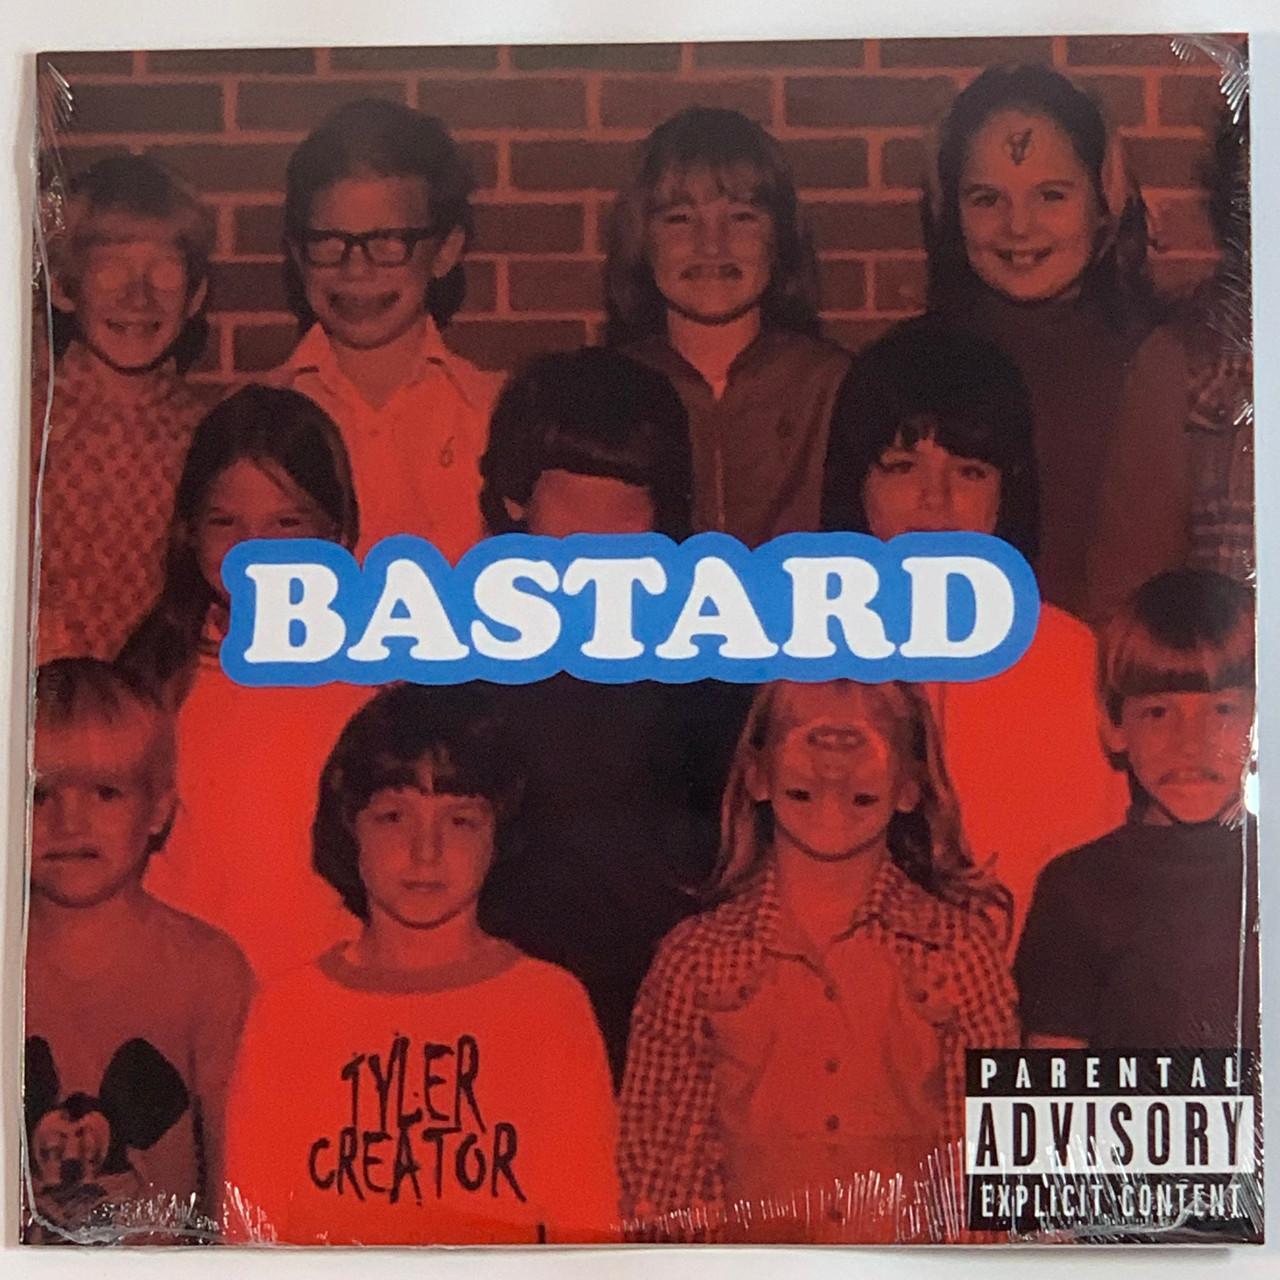 "Tyler, the Creator Bastard 2LP Vinyl Limited Black 12"" Record - A To Z Wax"